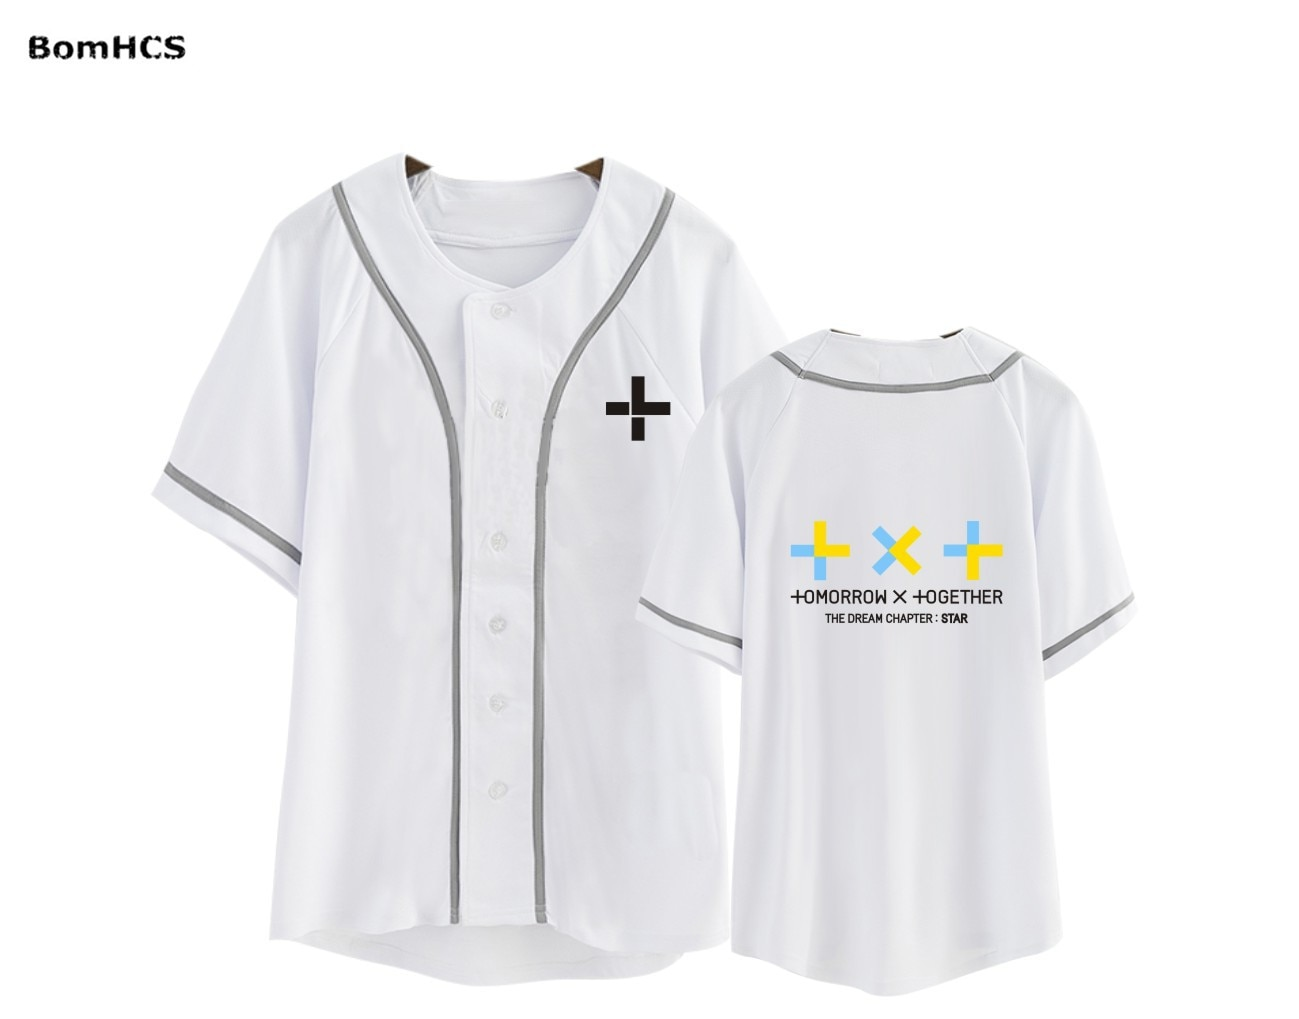 Camiseta de béisbol BomHCS Kpop TXT The Dream Chapter STAR de algodón, holgada de manga corta Camiseta deportiva (blanco y negro)